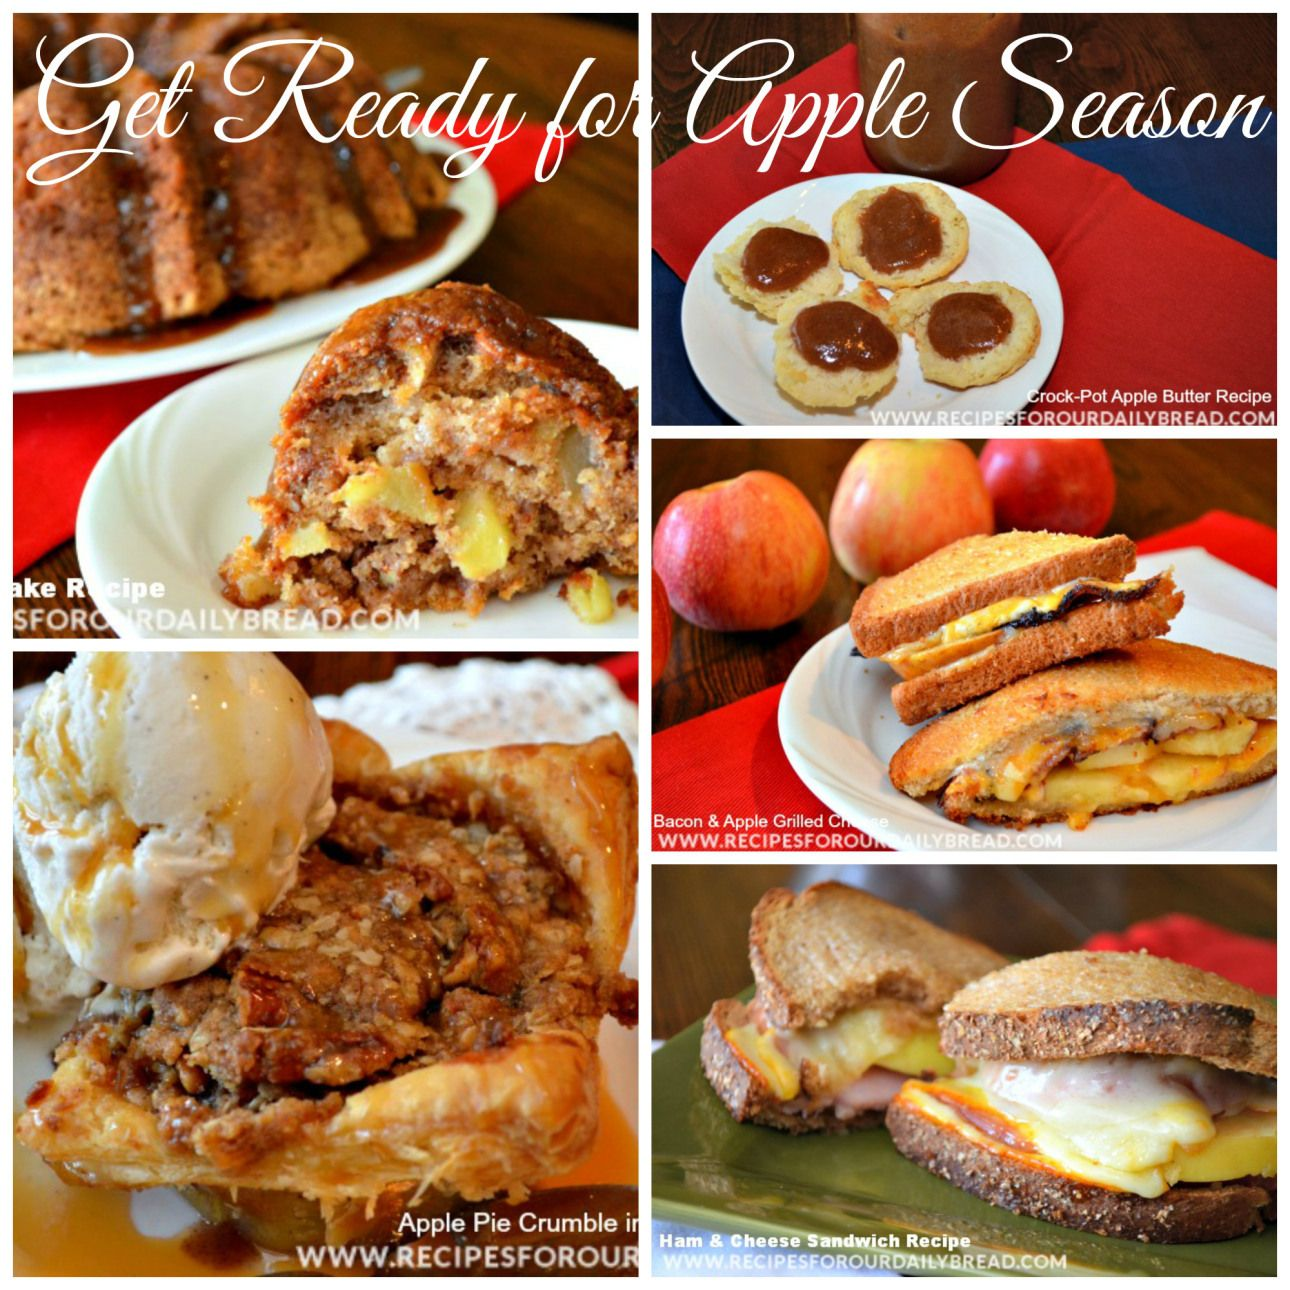 Amazing Apple Roundup http://recipesforourdailybread.com/2014/09/07/best-apple-recipe-roundup/